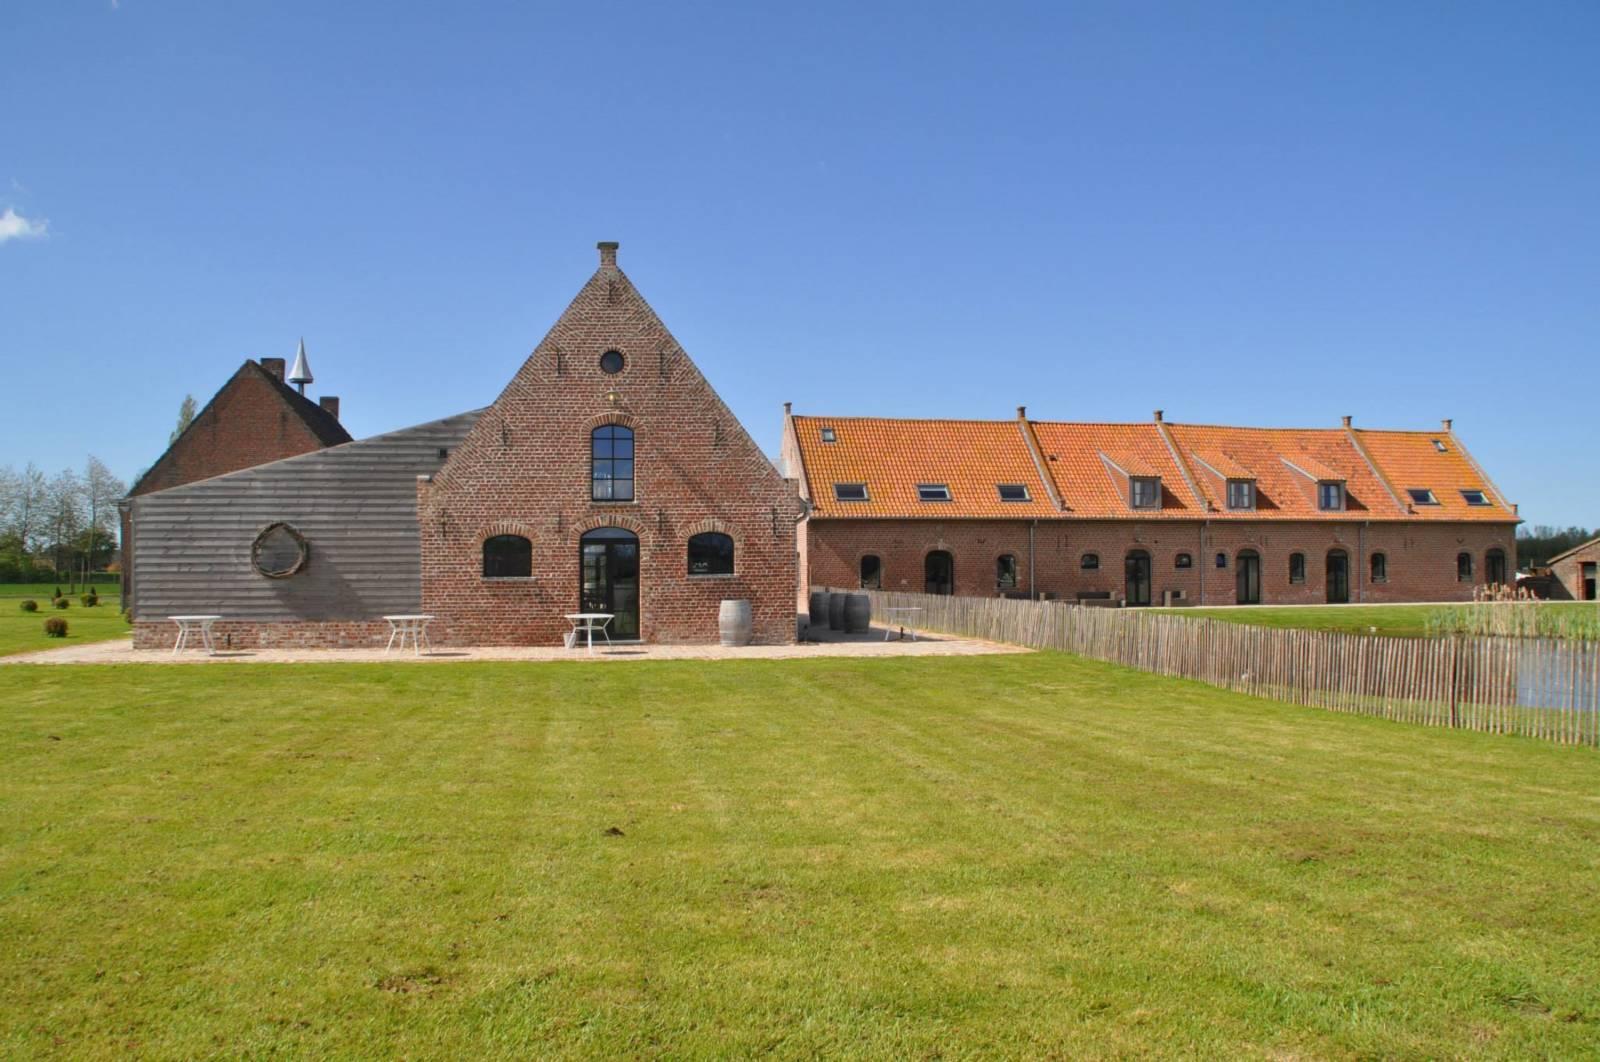 House of Weddings Domein t Eikennest Feestzaal Catering ceremonie West Vlaanderen slaapkamers (7)